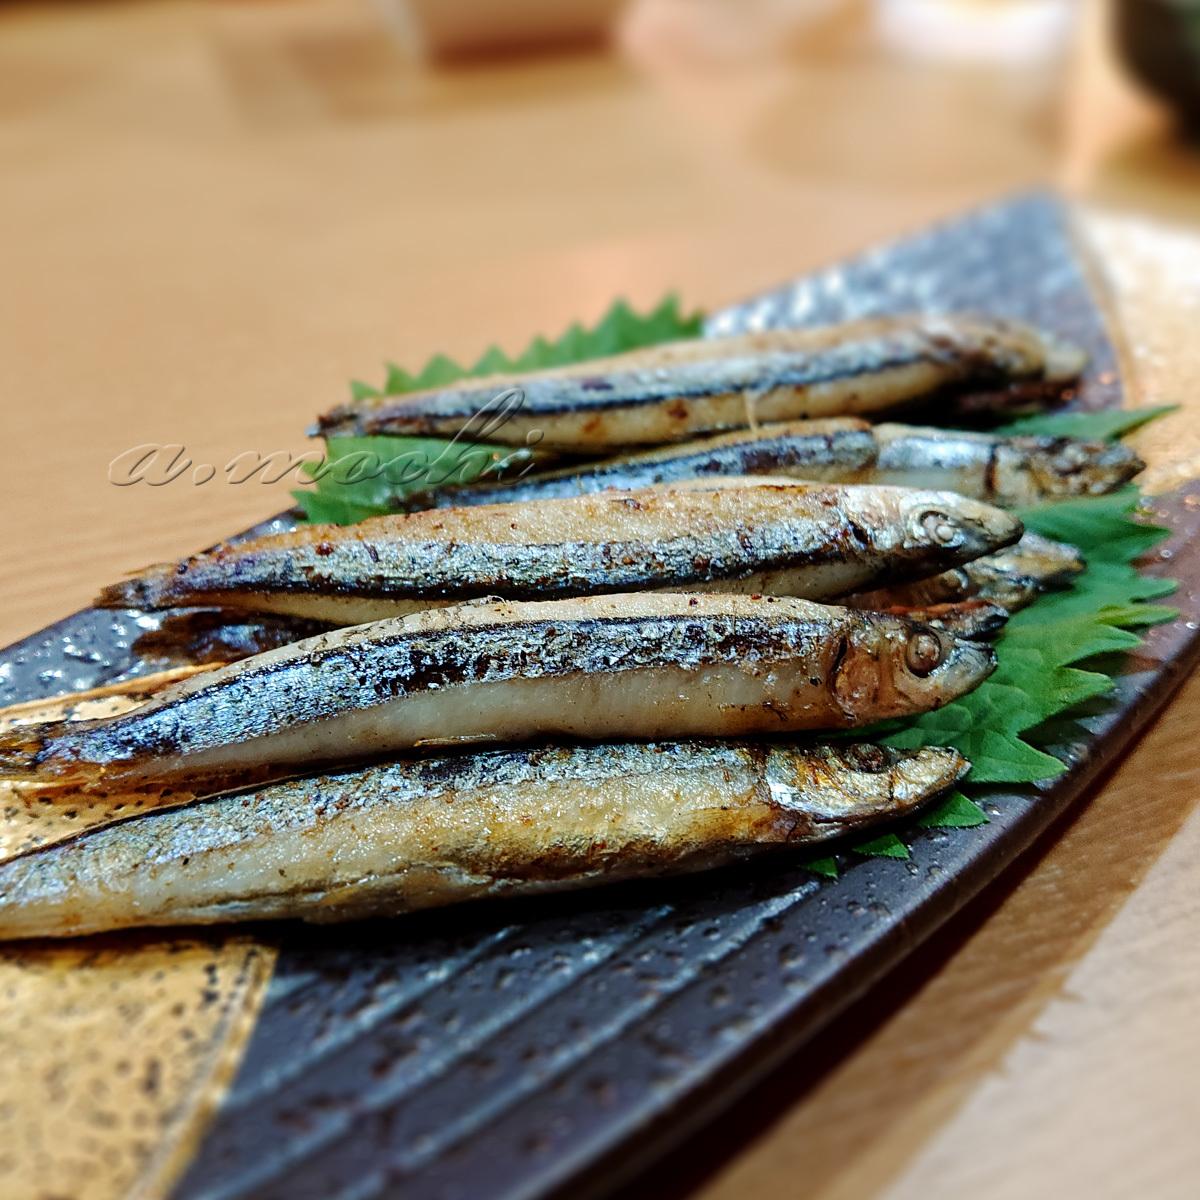 tsuwabuki_kibinago.jpg